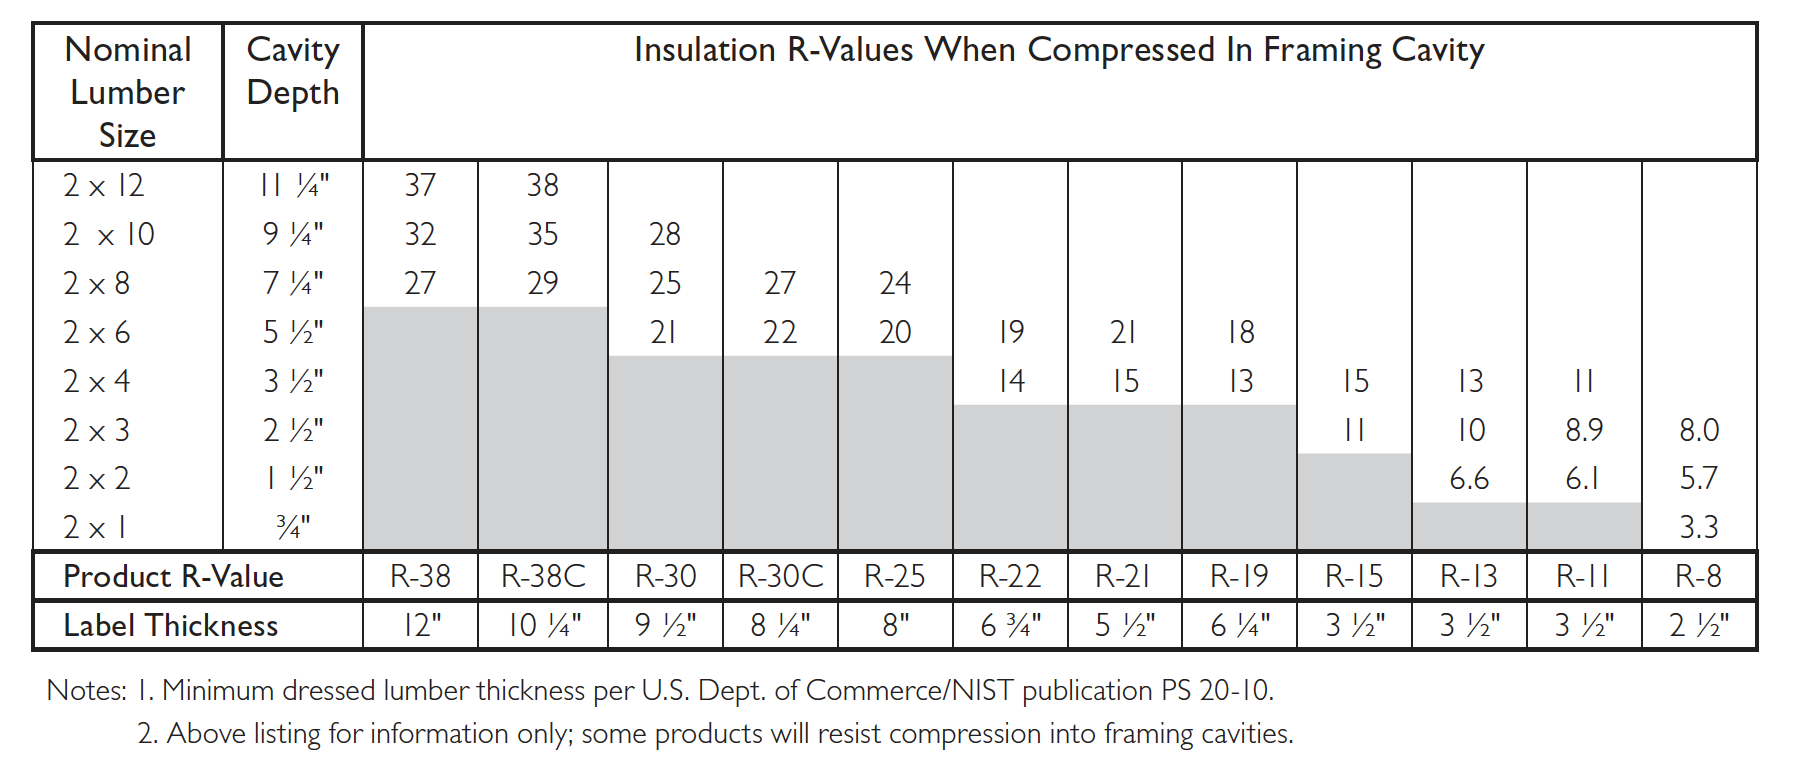 Owens Corning compressed fiberglass insulation R-value chart